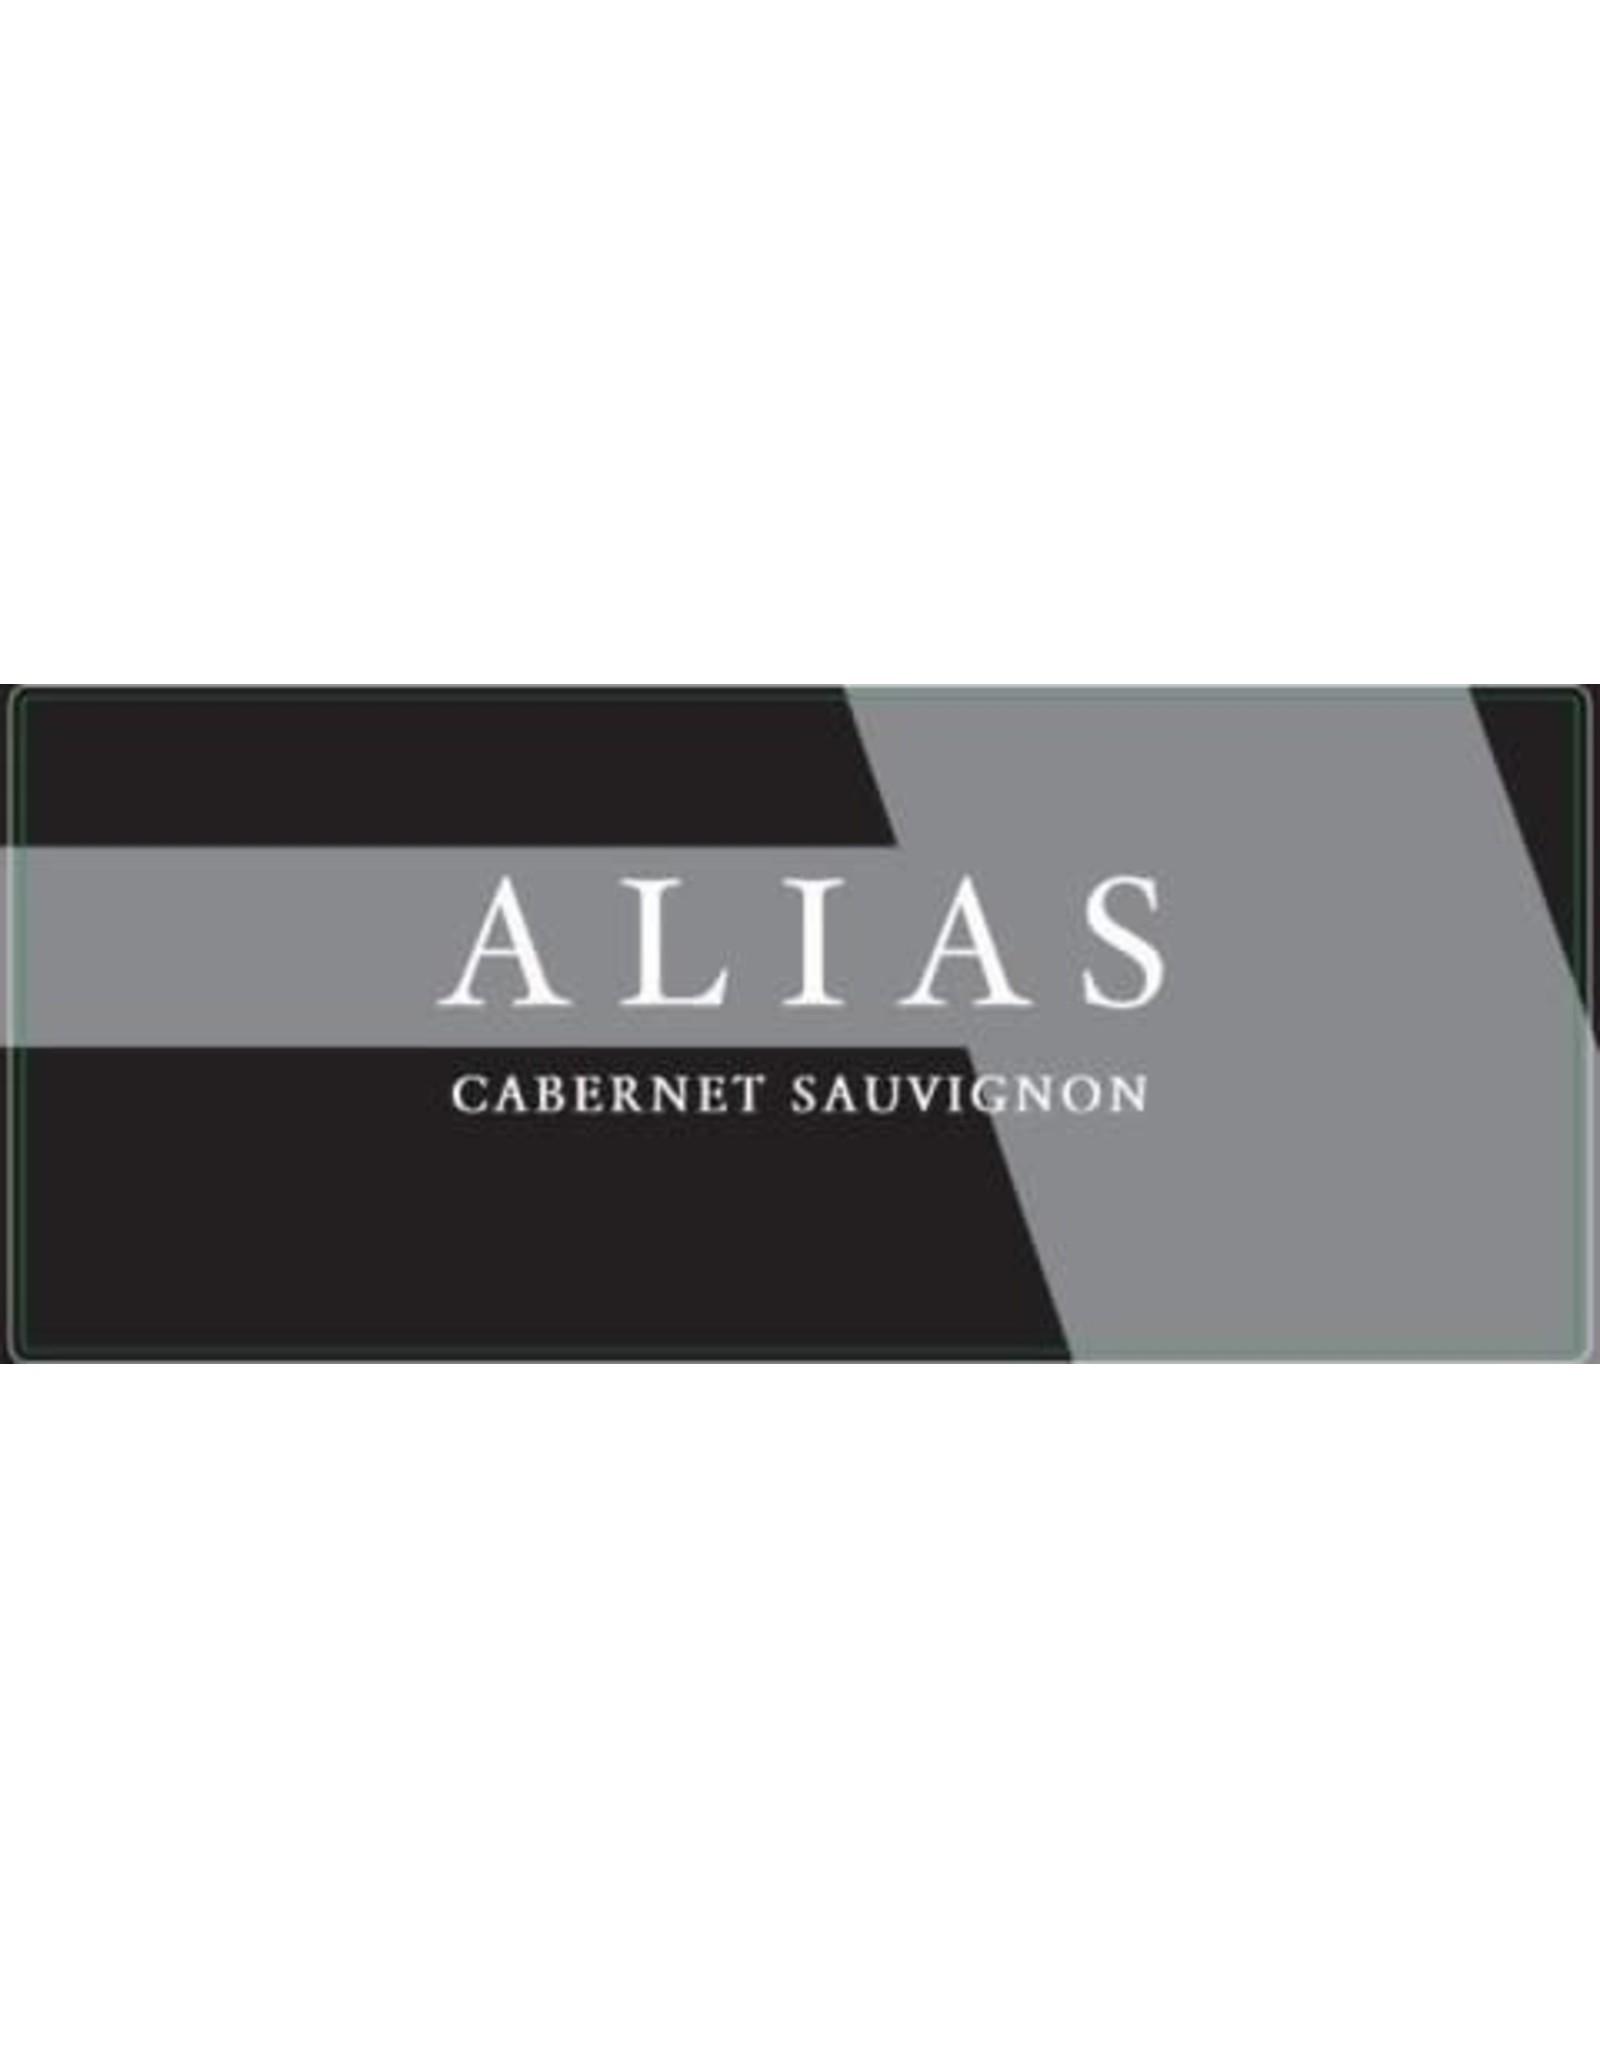 Alias Cabernet Sauvignon 2018